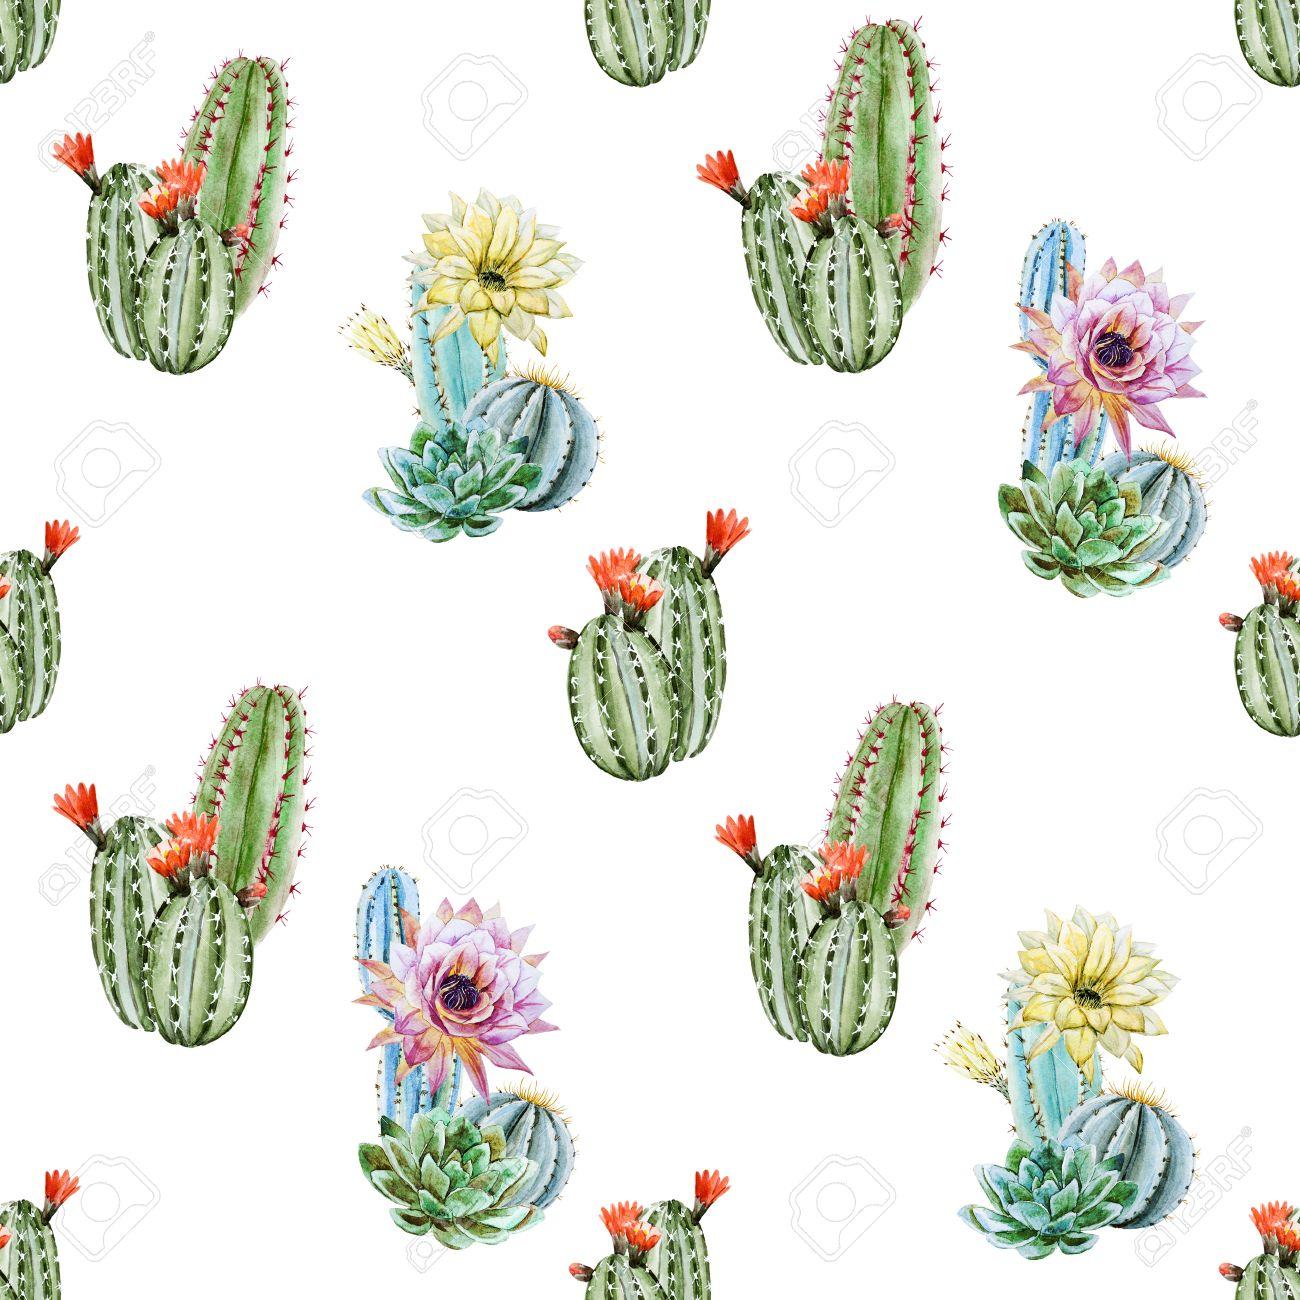 Beautiful Raster Image With Nice Watercolor Cactus Stock Photo